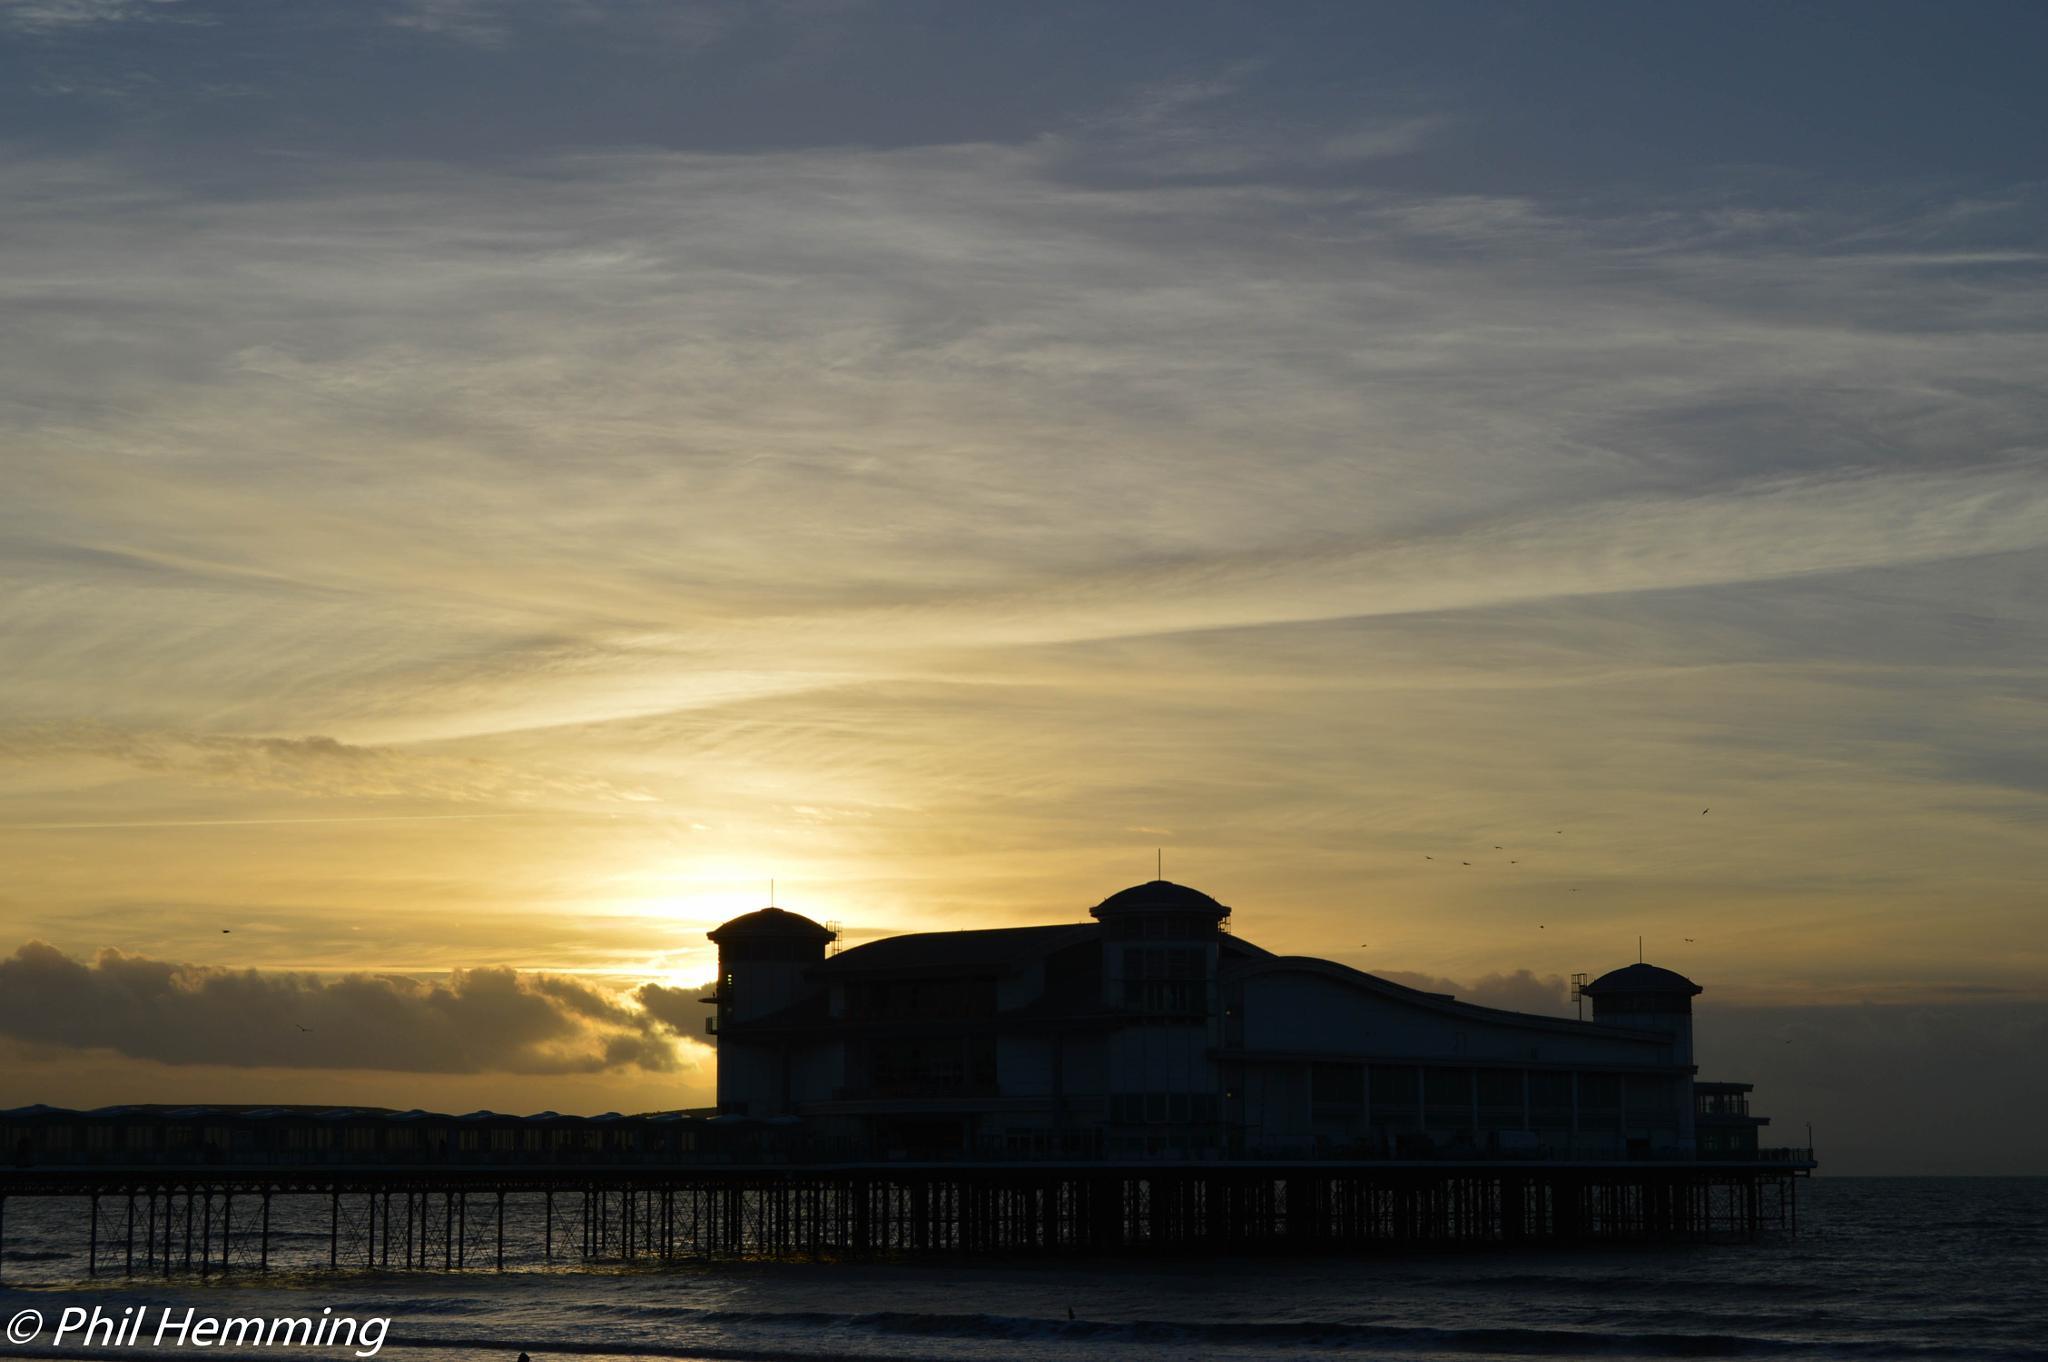 Sunset Silhouetting The Grand Pier WSM by philip.hemming1